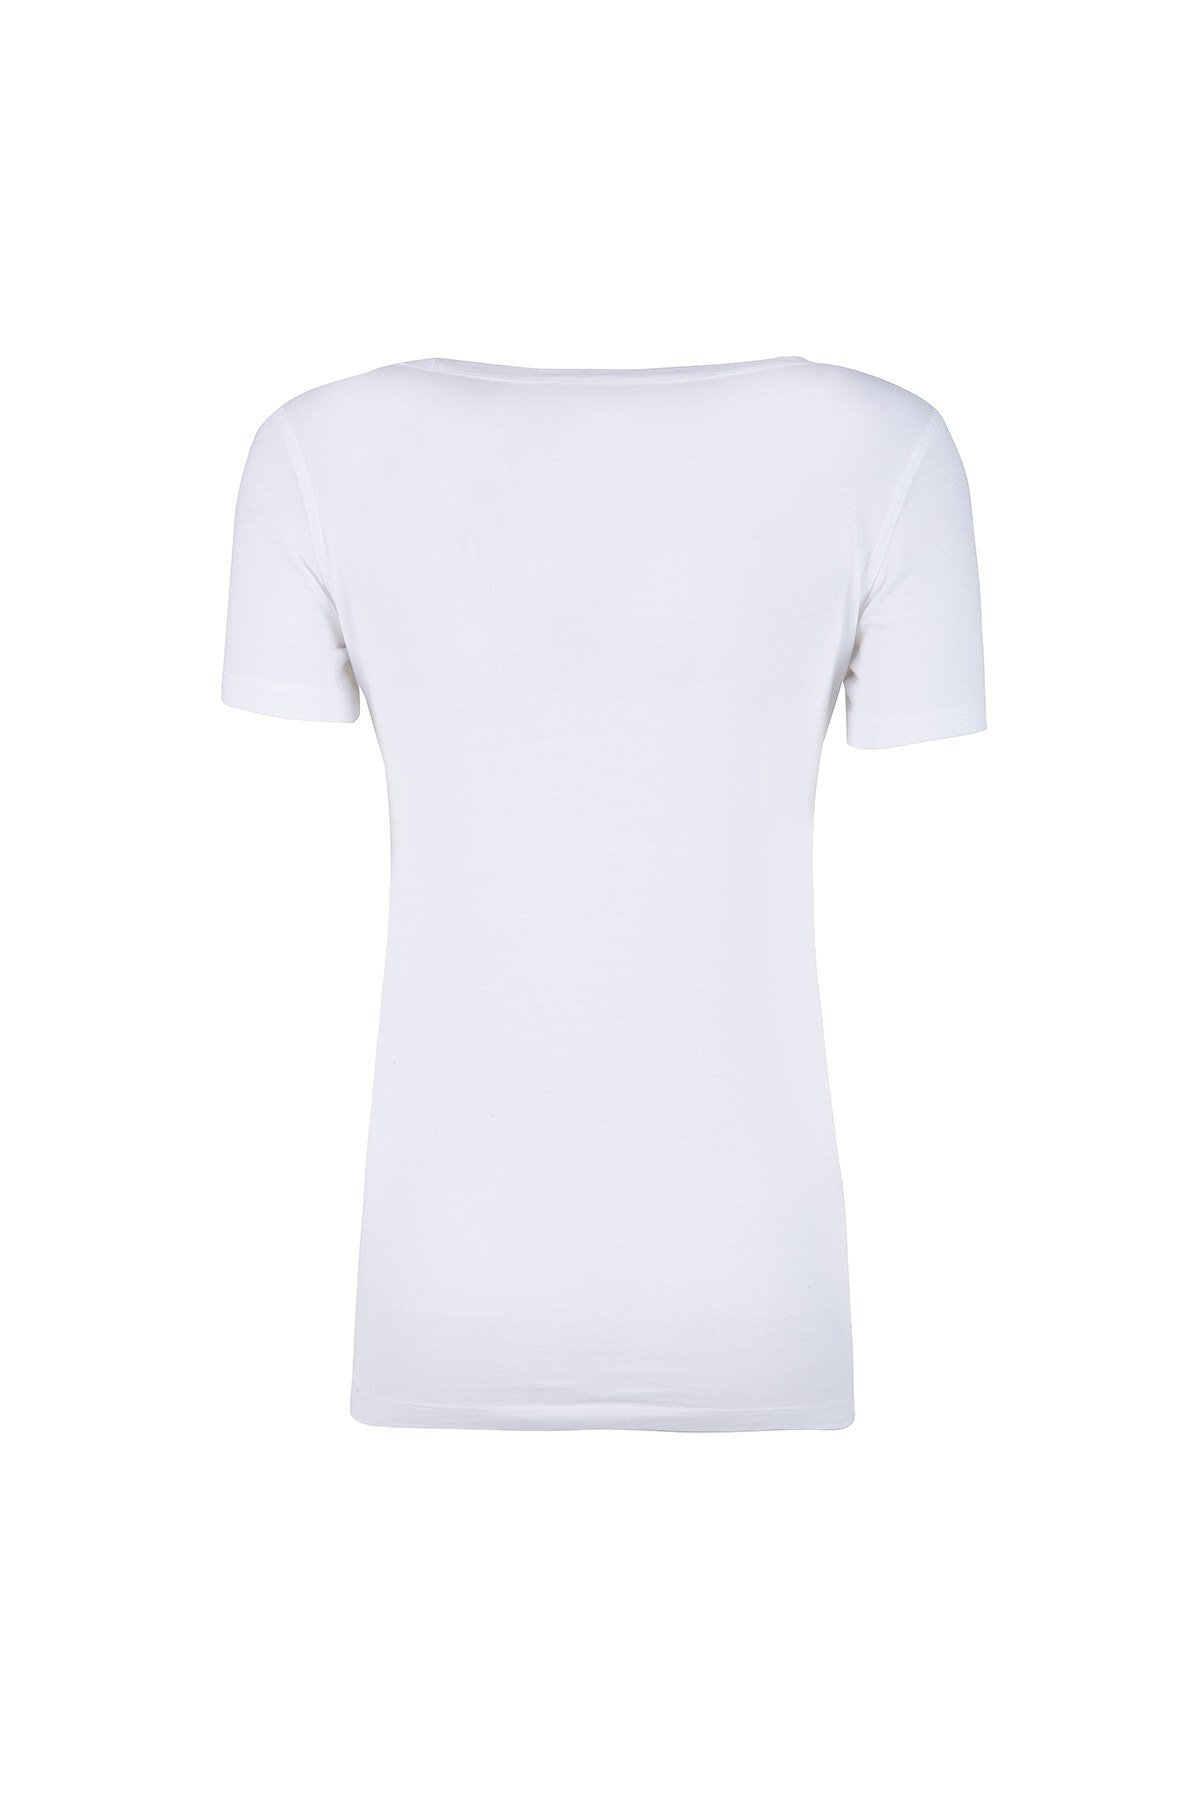 PIERRE BALMAIN T SHIRT Kadın T Shirt FP18007EA8008 004 BEYAZ